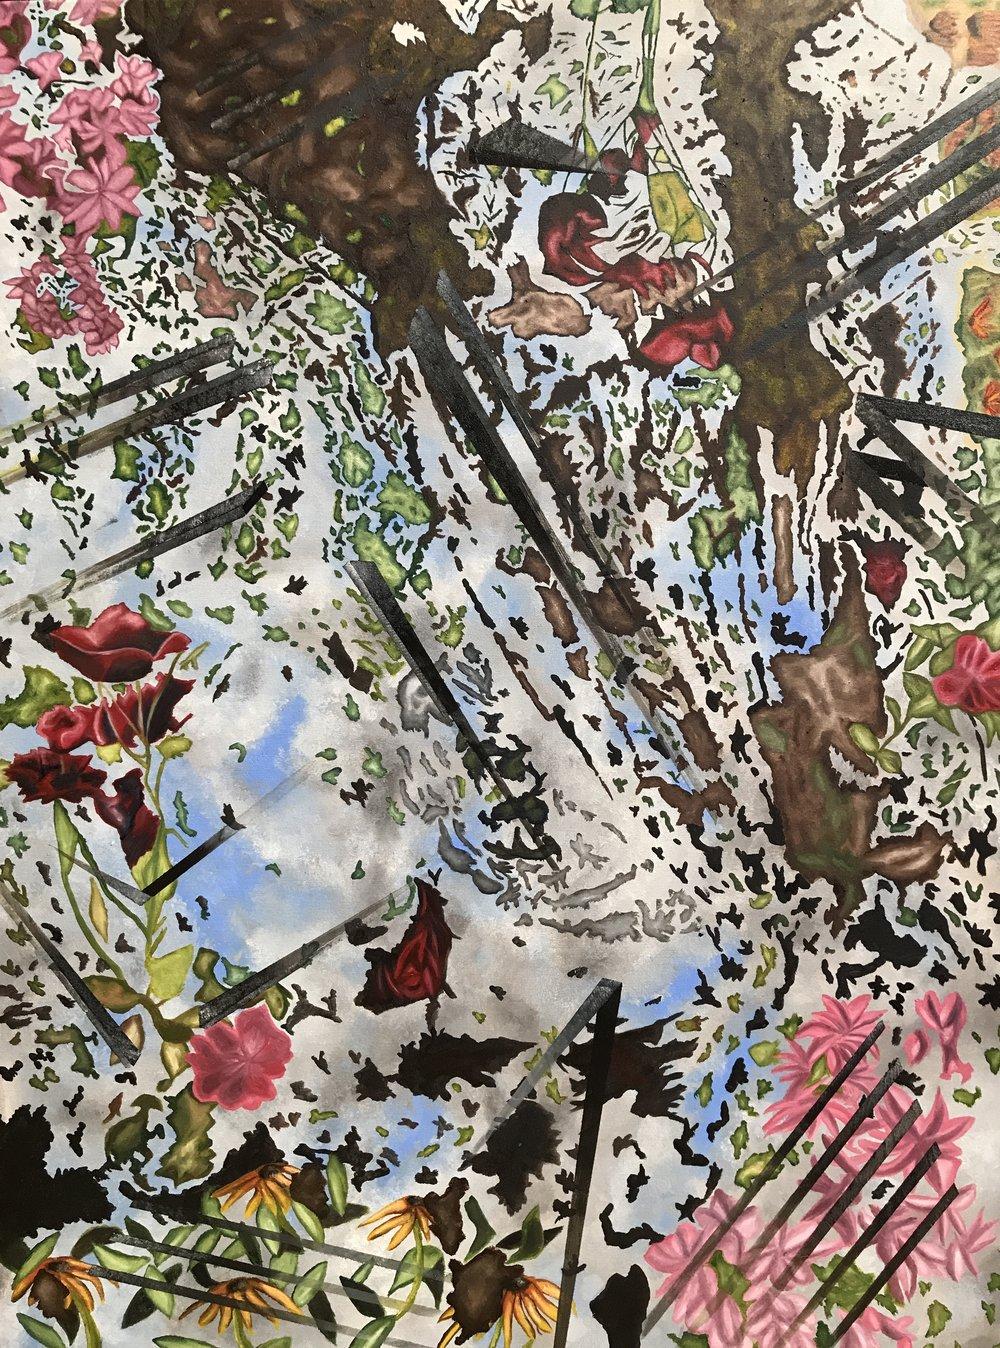 Rococo Futurism I, 2017 | Oil on Linen | 97 x 127 cm | £3,500 -For sales enquiries please email info@focusldn.com